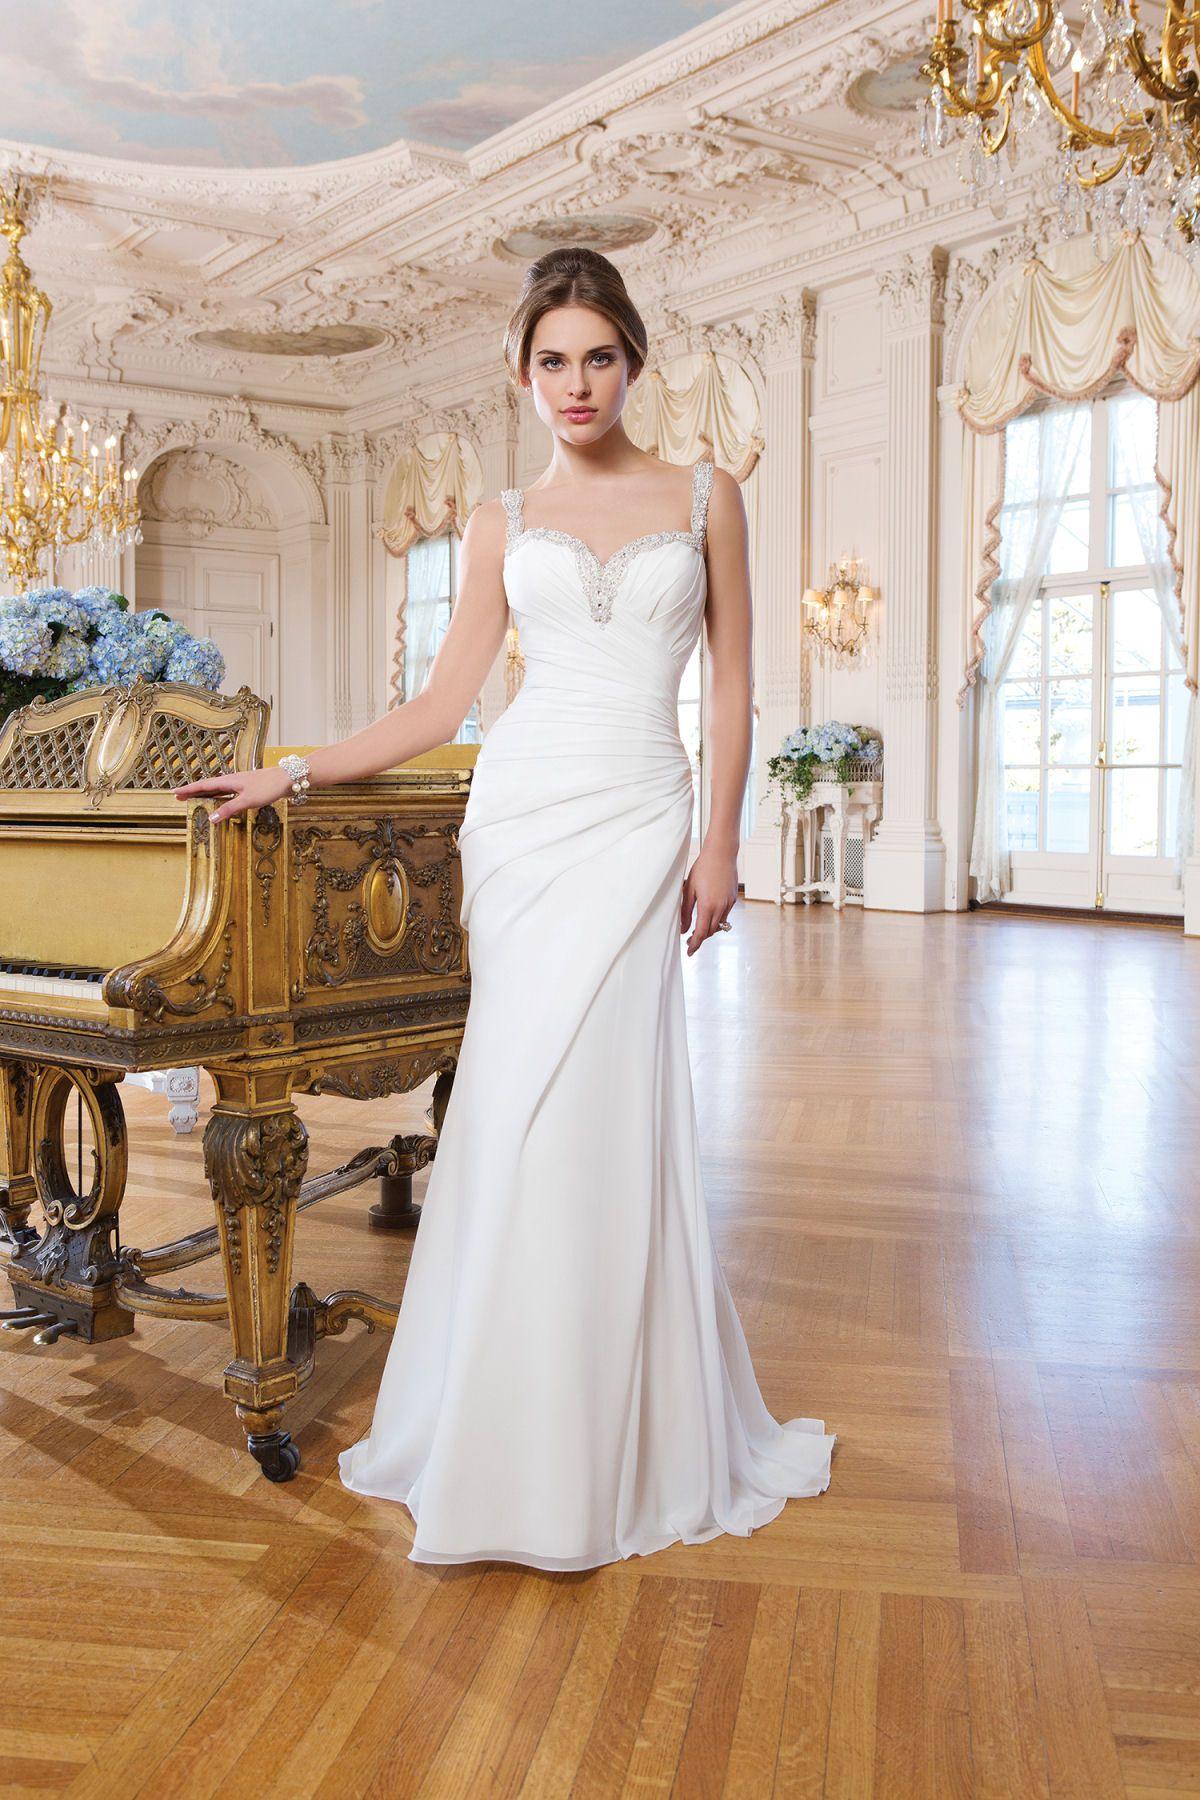 Lillian west wedding dress   from Lillian West  Beautiful Wedding Dresses and Bridalwear